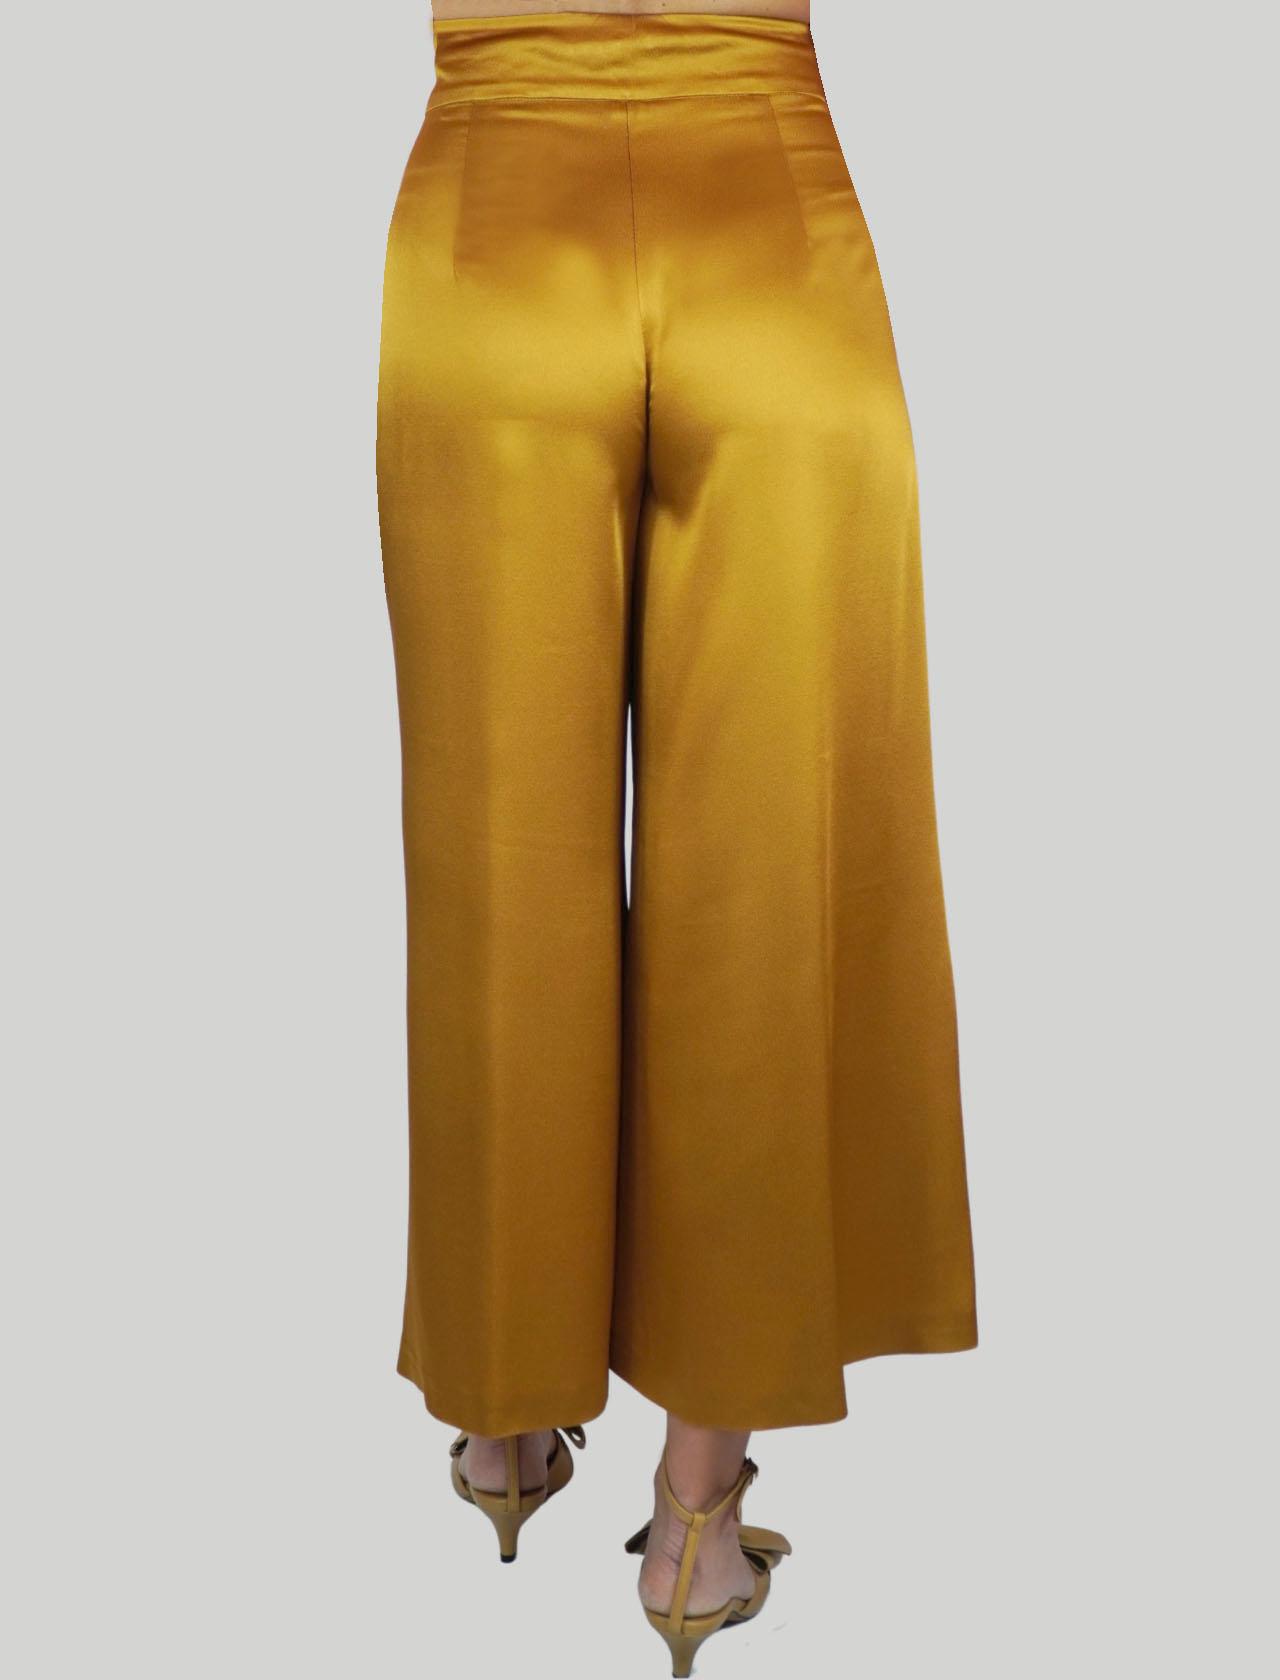 Women's Clothing Liquid Cady Pants Mustard Wide Leg Maliparmi | Skirts and Pants | JH71915012370013